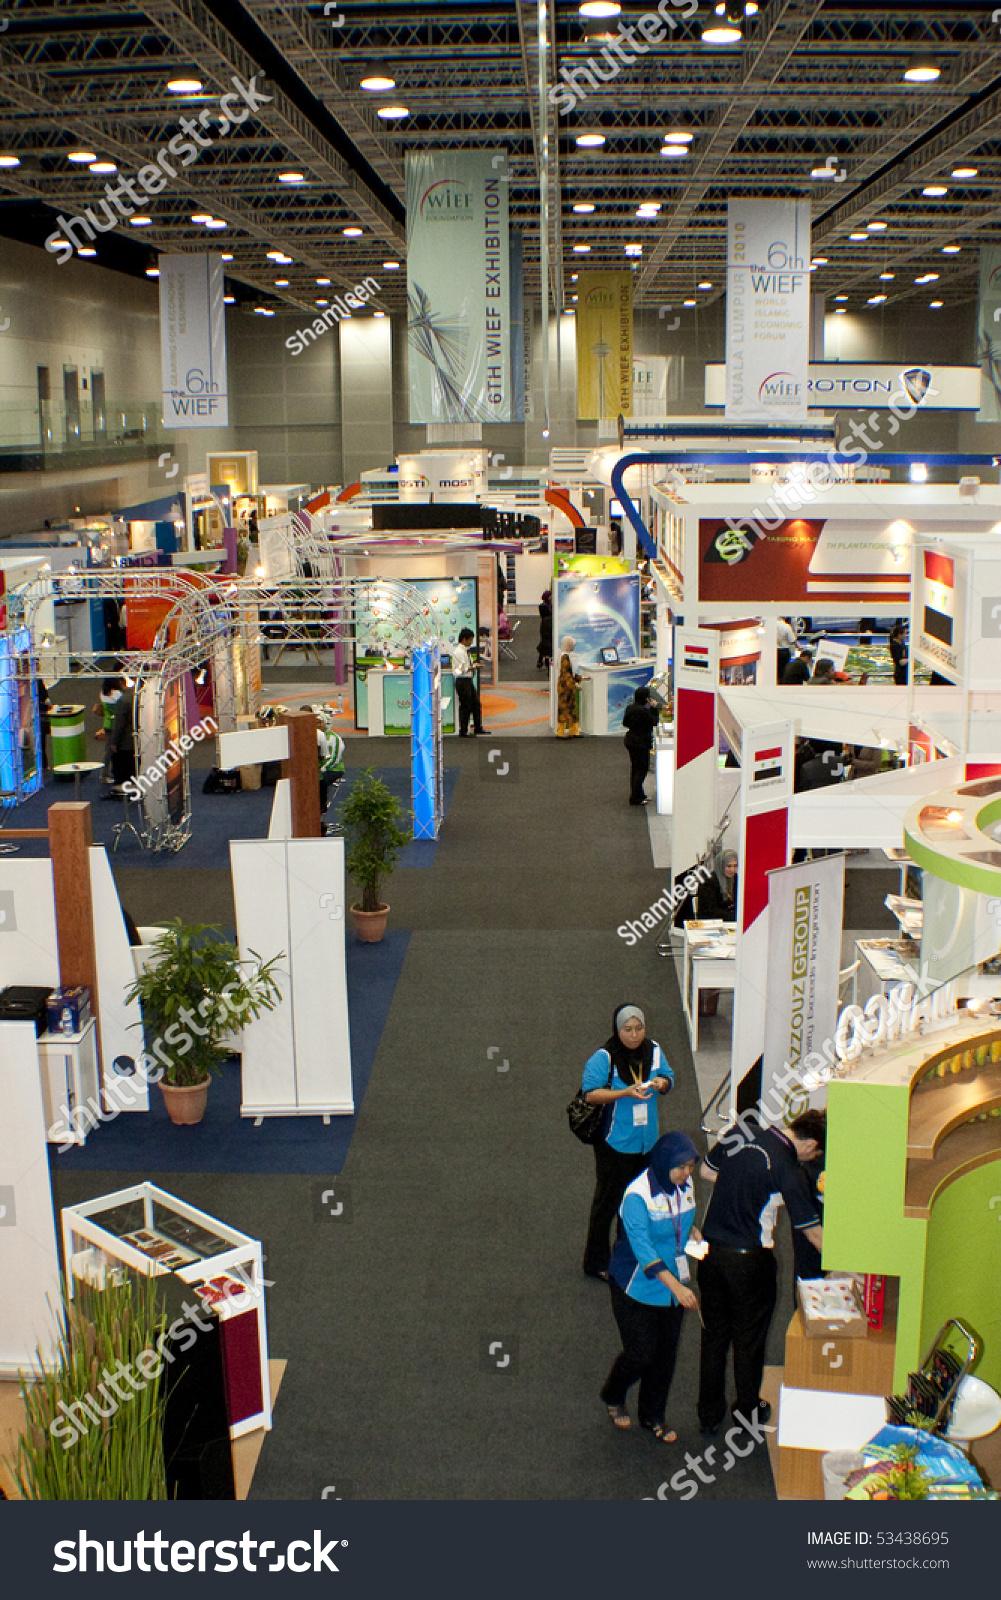 Exhibition Booth Rental Kuala Lumpur : Kuala lumpur malaysia mei row of exhibition booth